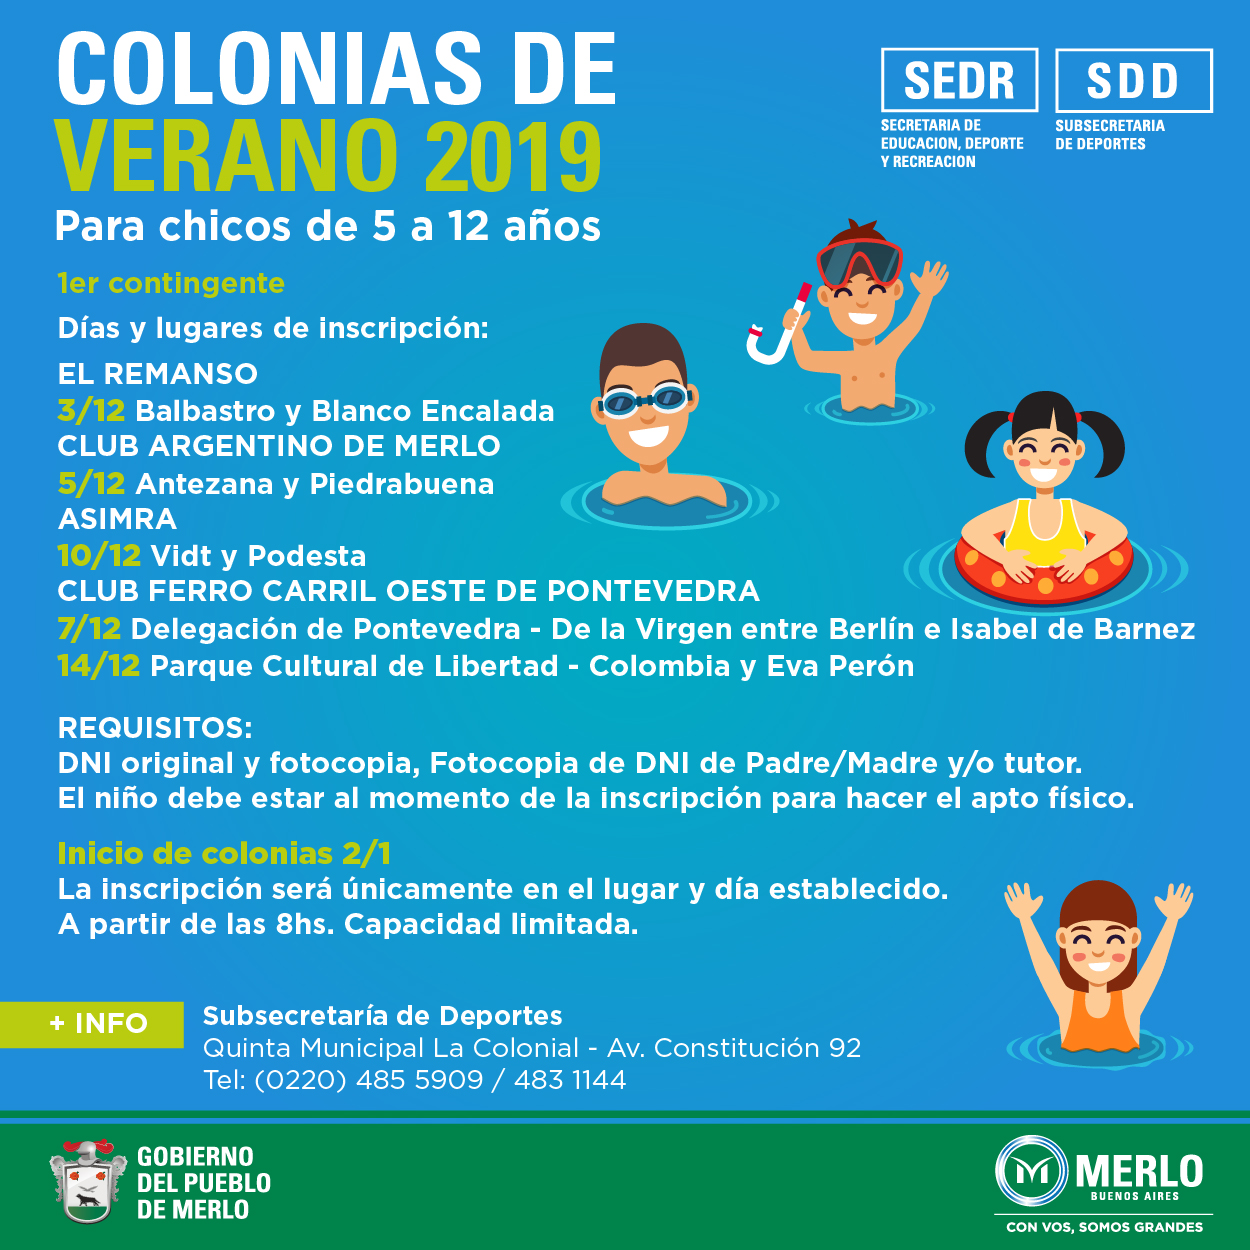 M3927_SDD_Posts_Colonias_de_Verano_2019-fb-1.jpg